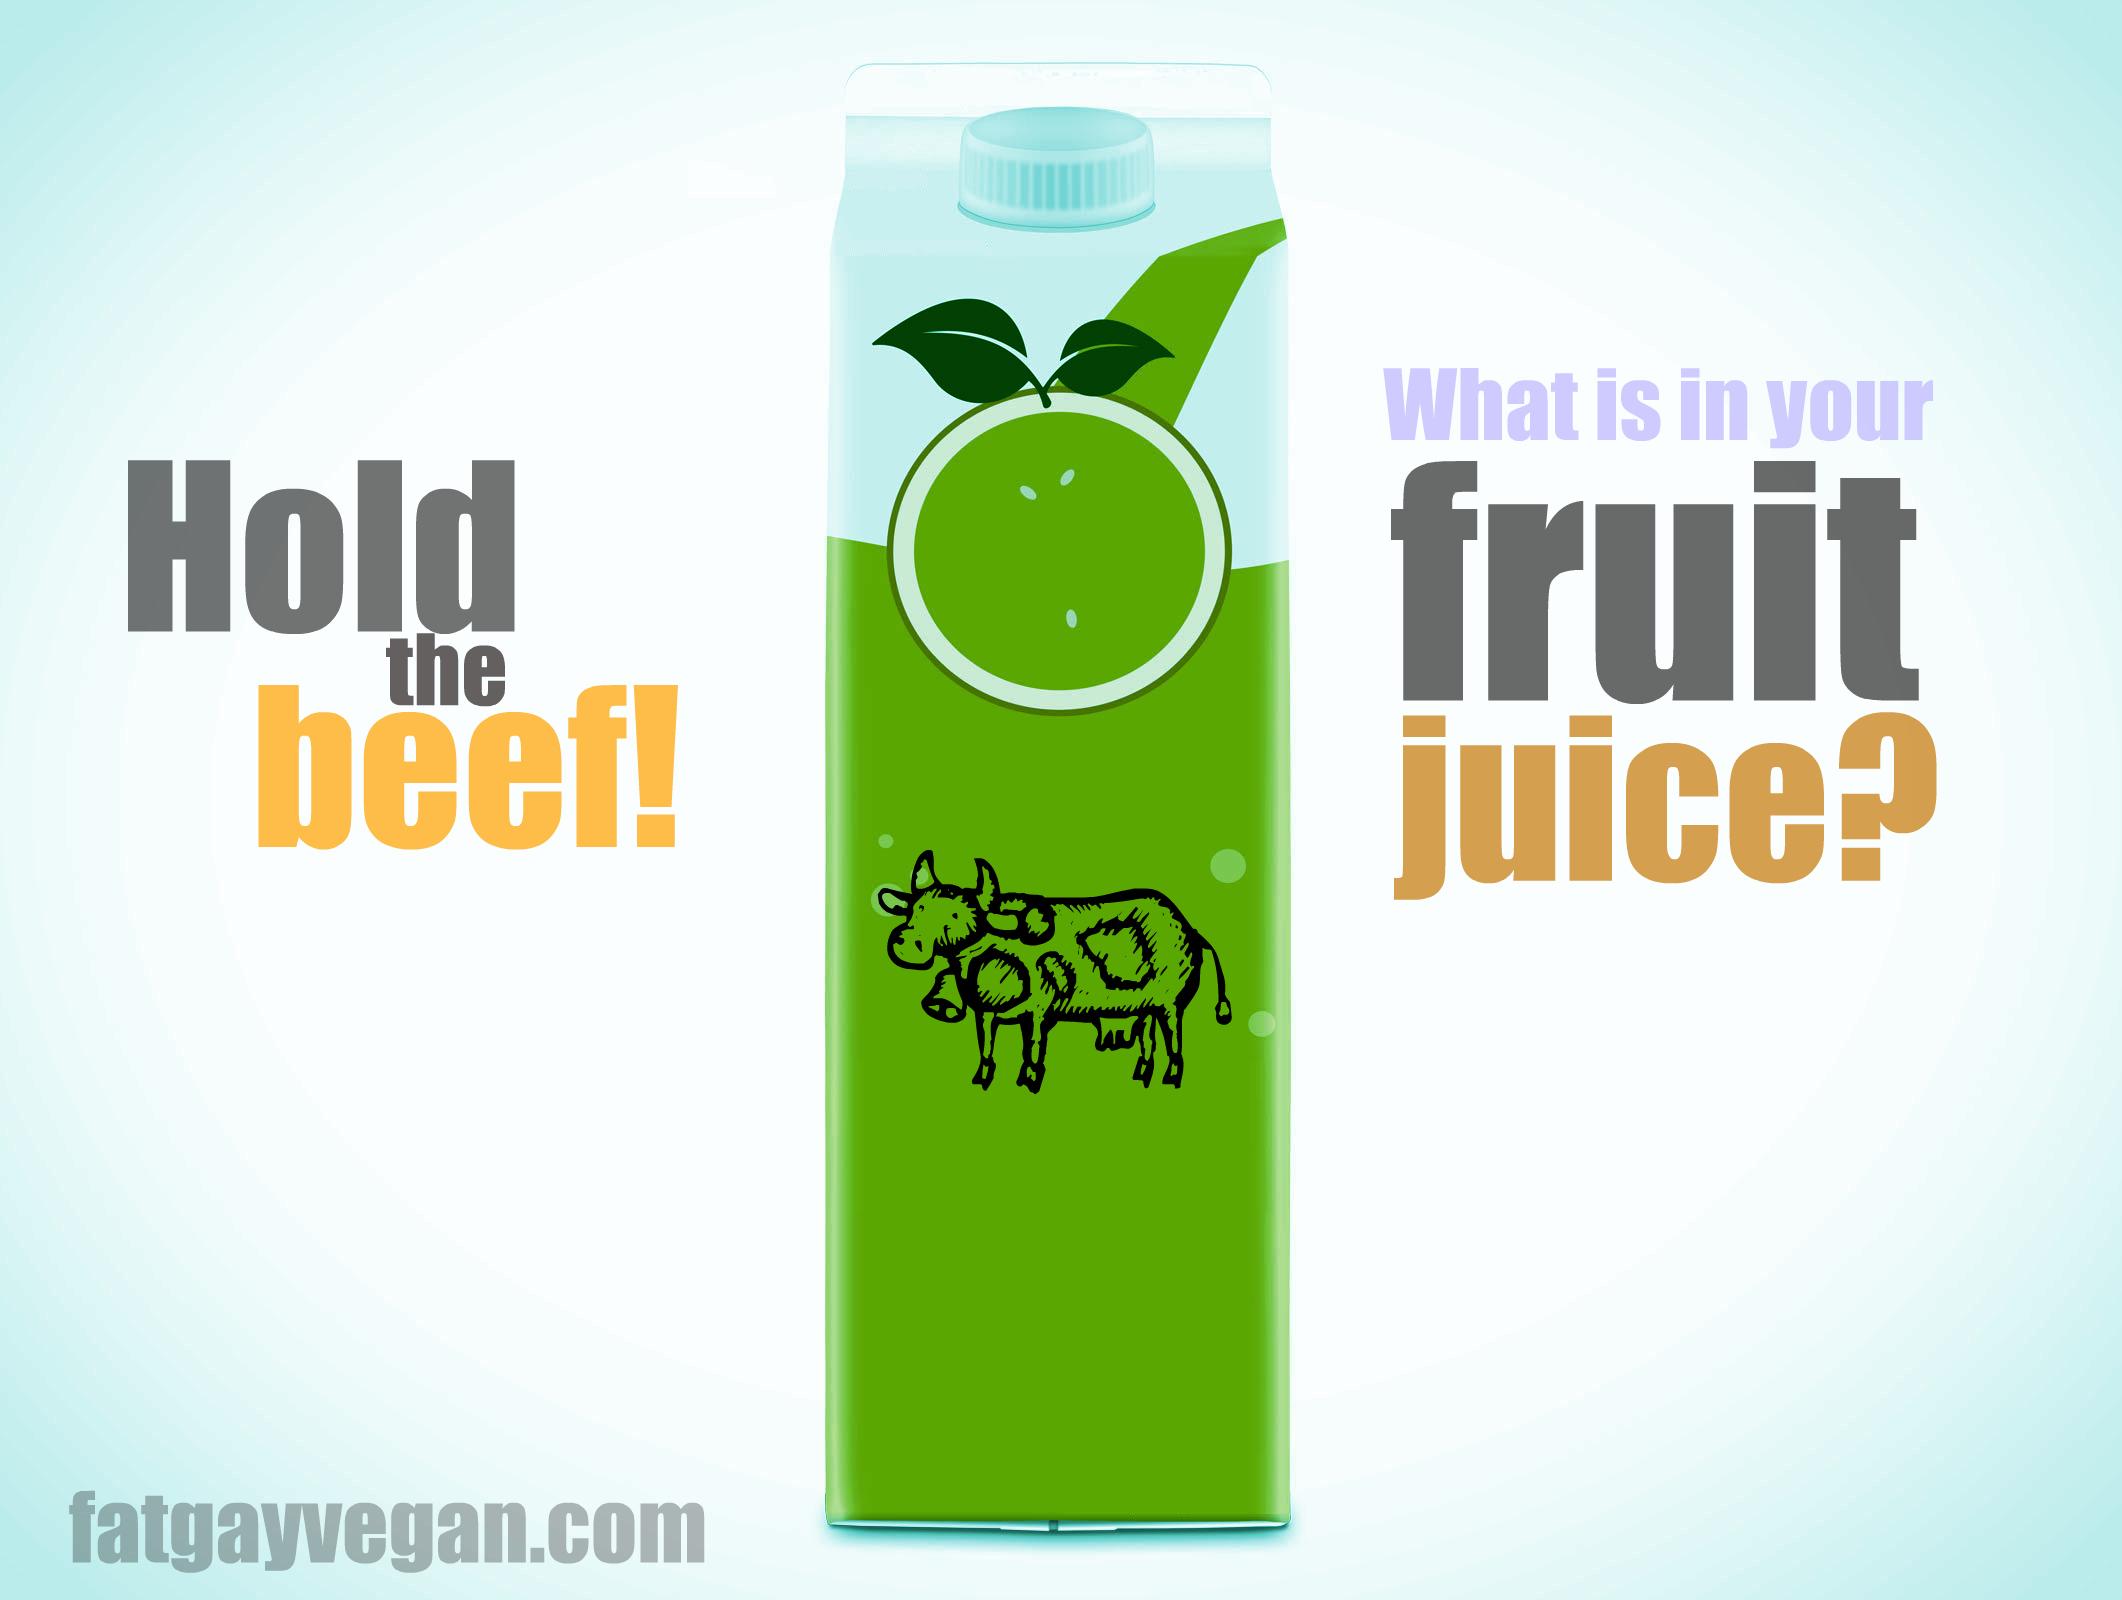 http://i2.wp.com/fatgayvegan.com/wp-content/uploads/2014/07/beef-juice.jpg?fit=2122%2C1600